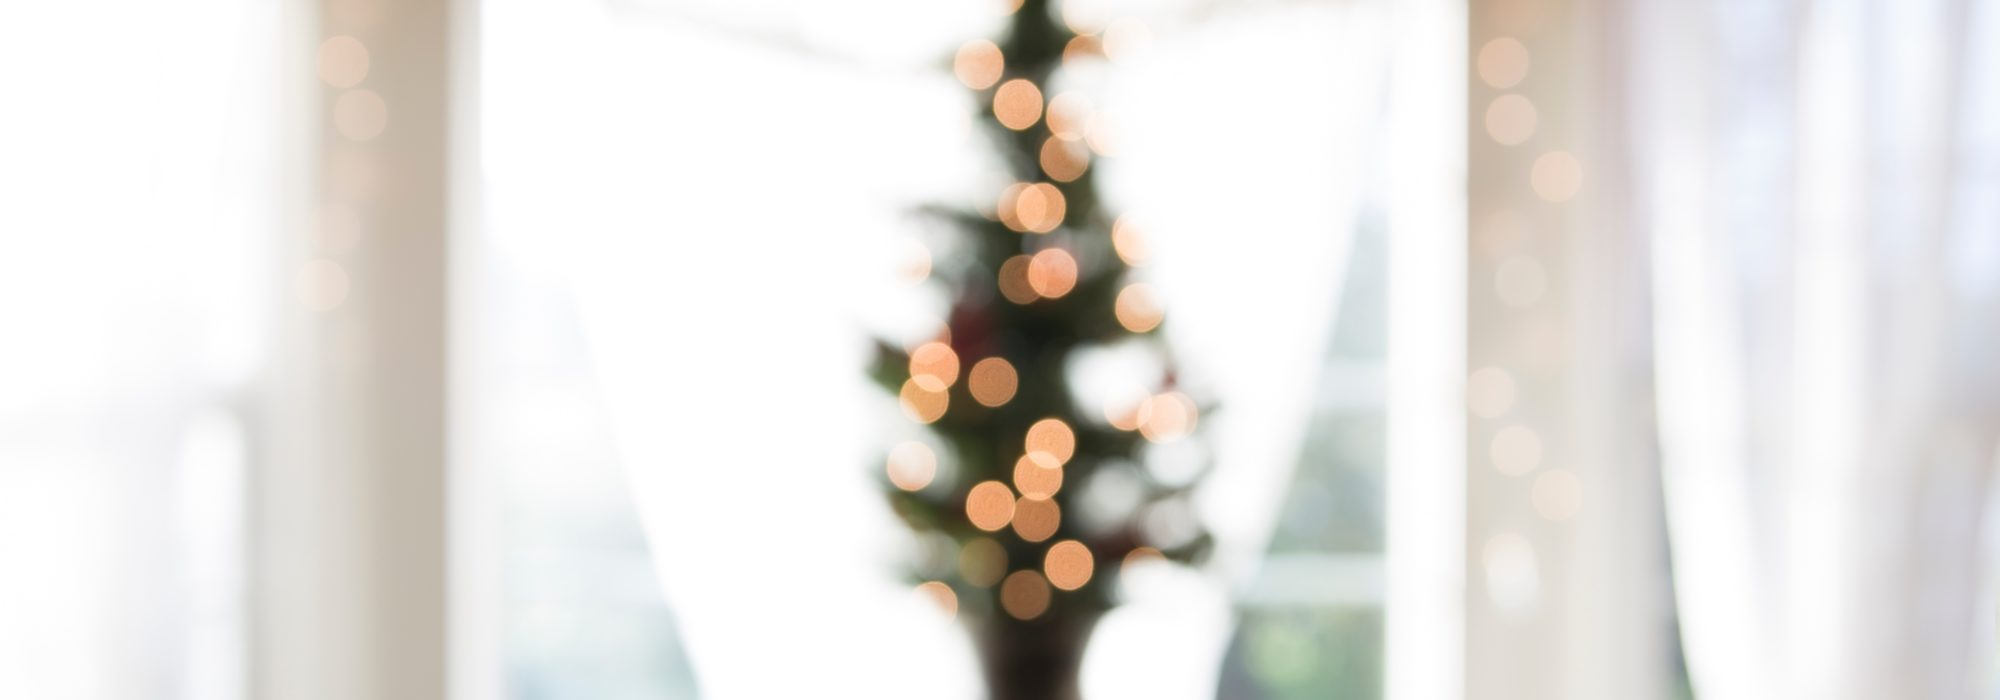 Balanced Holidays- Enjoy Life in Chaos